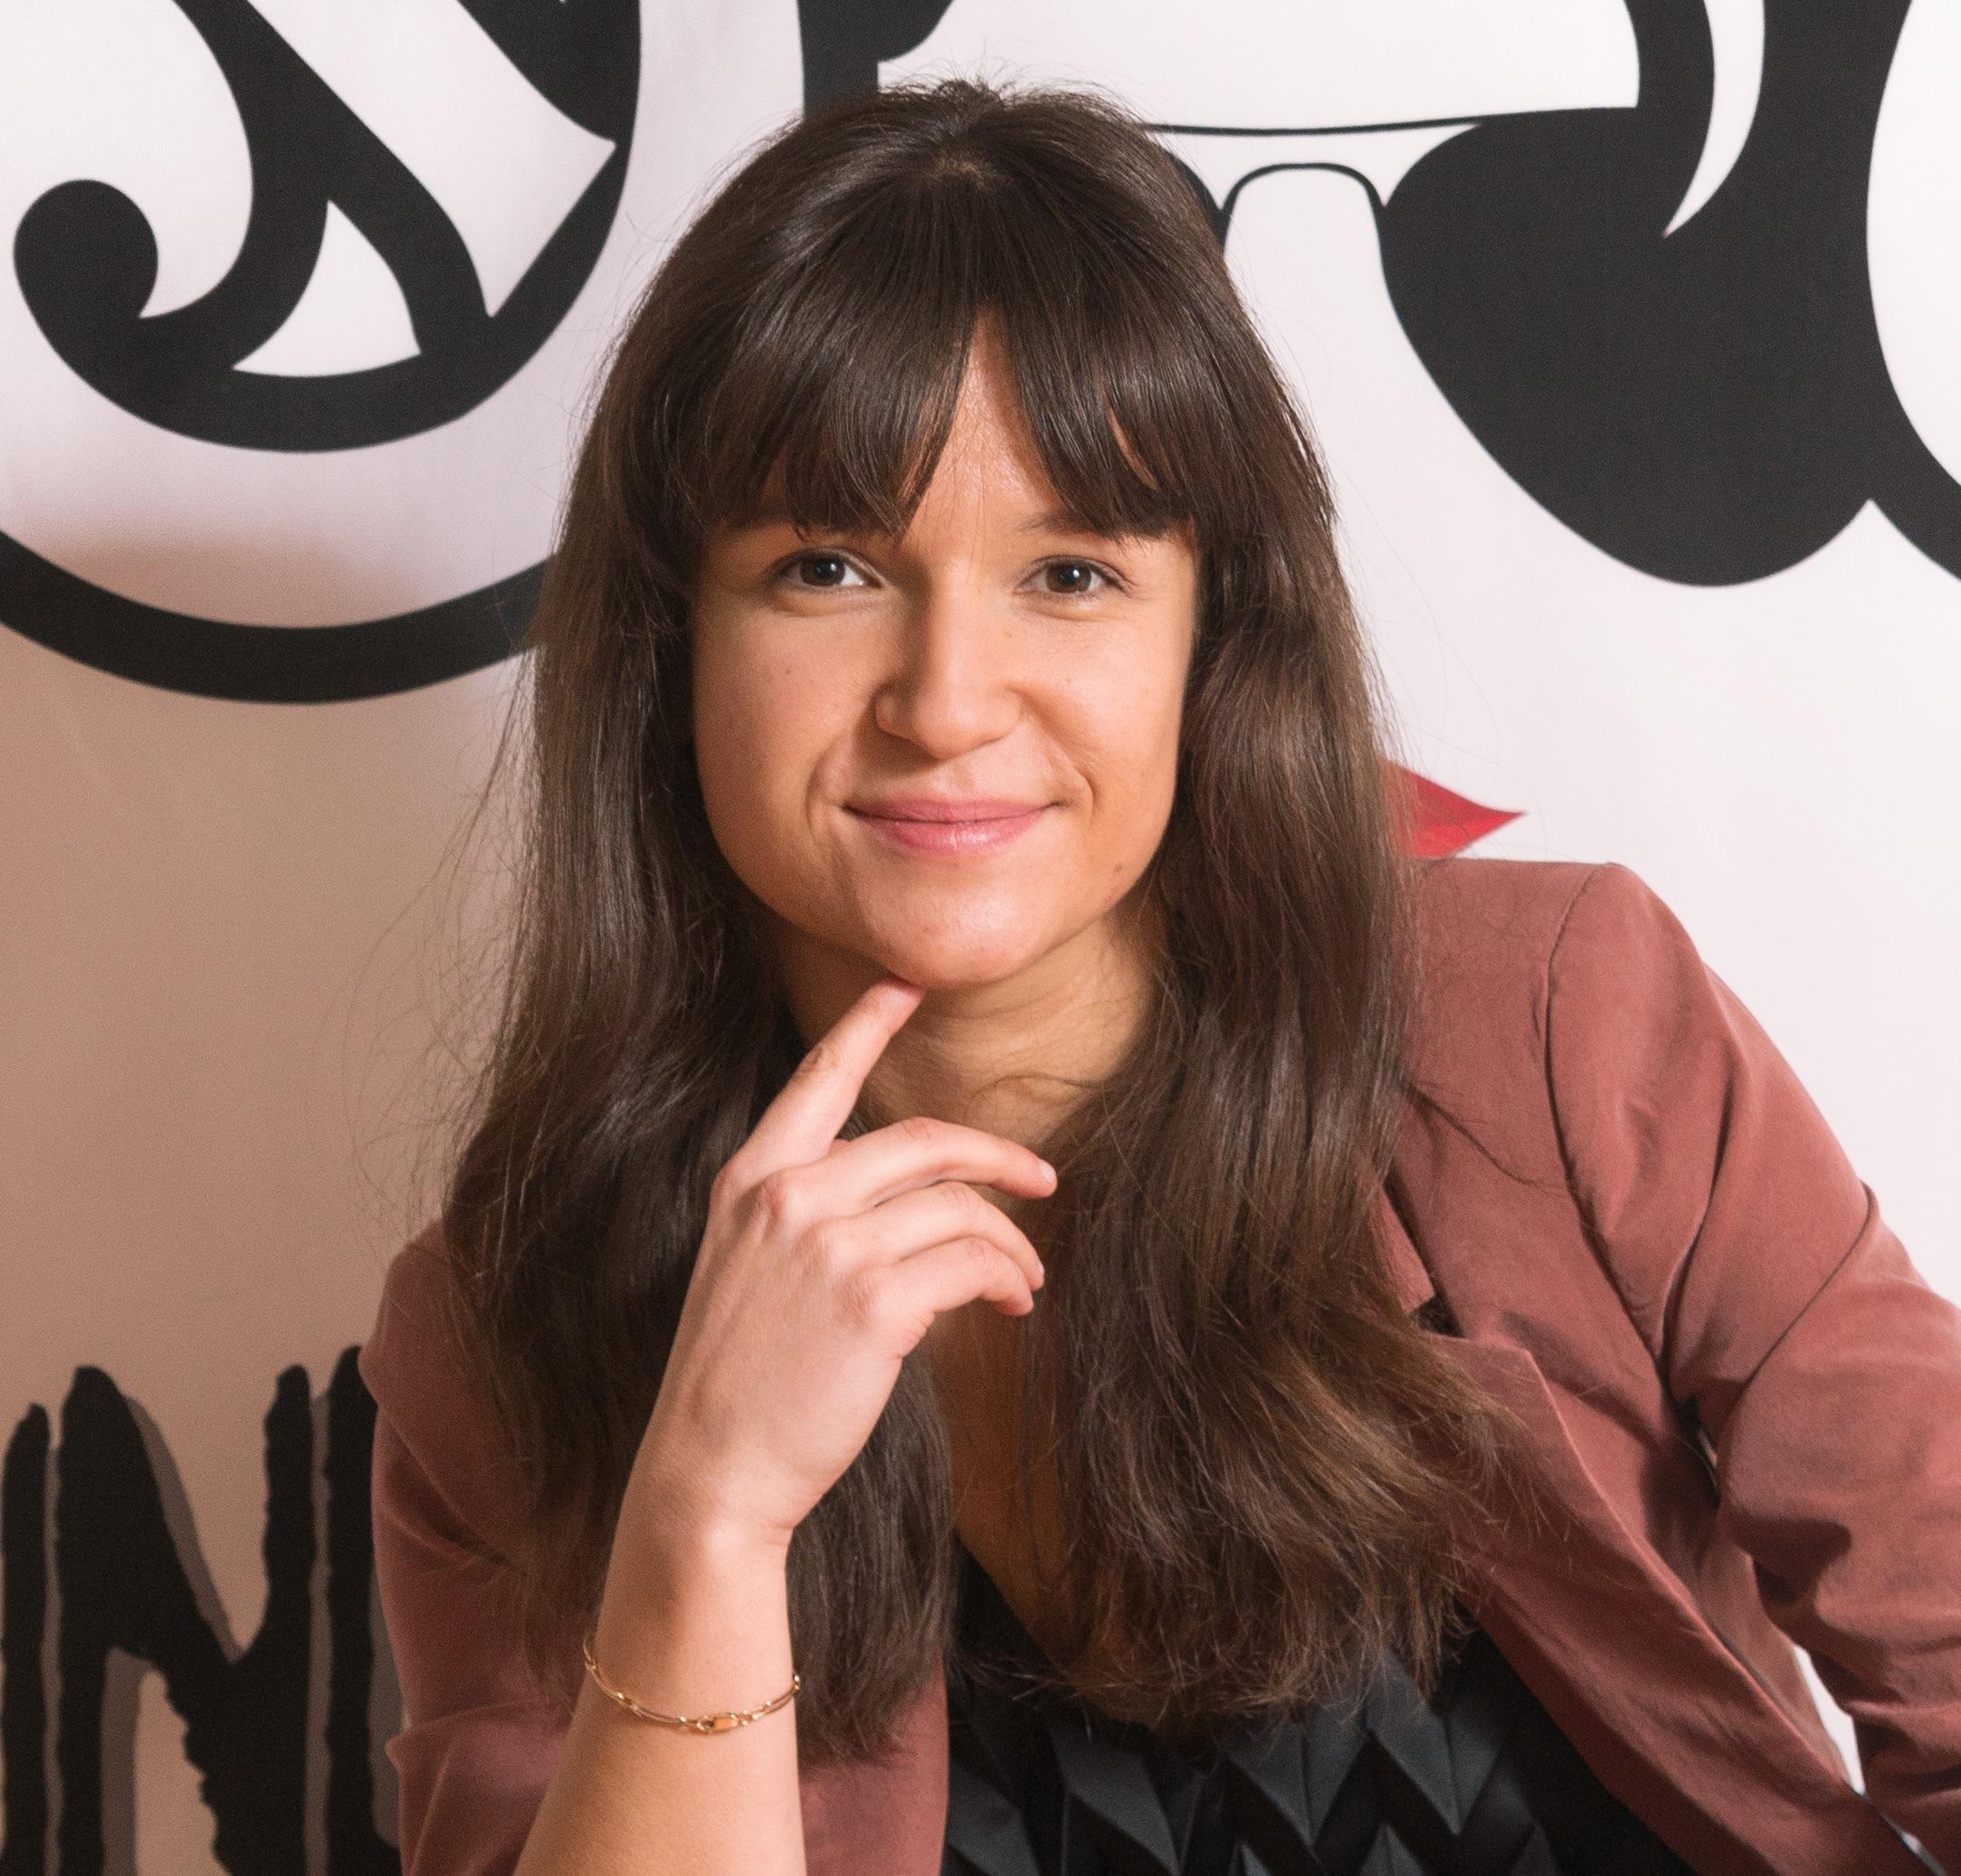 Anne-Lise Teruel